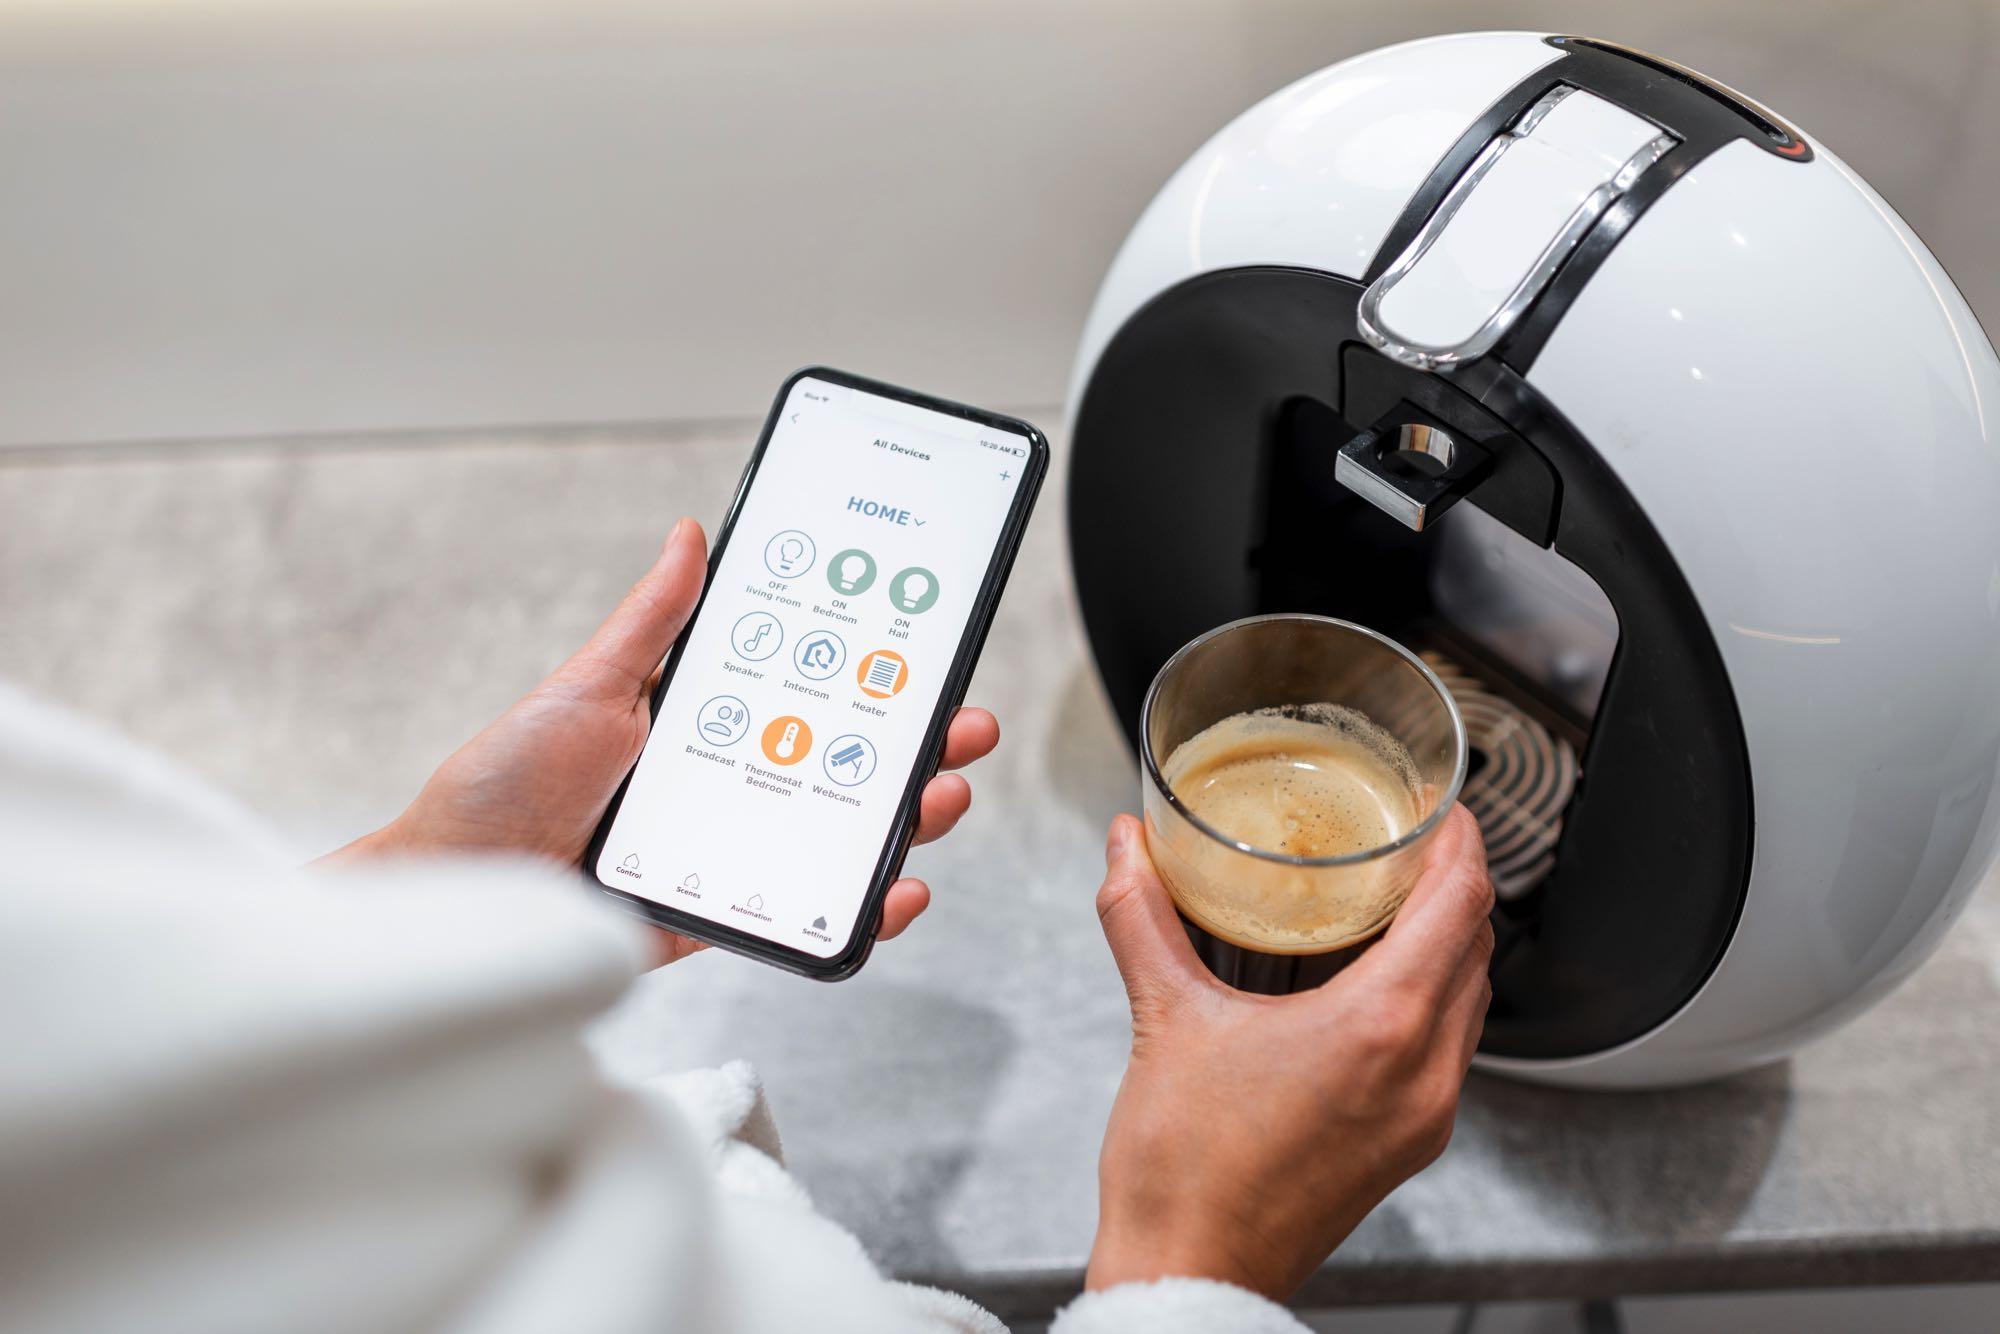 cotrolling-coffe-machine-with-a-smart-phone-XEXBWNJ.jpg